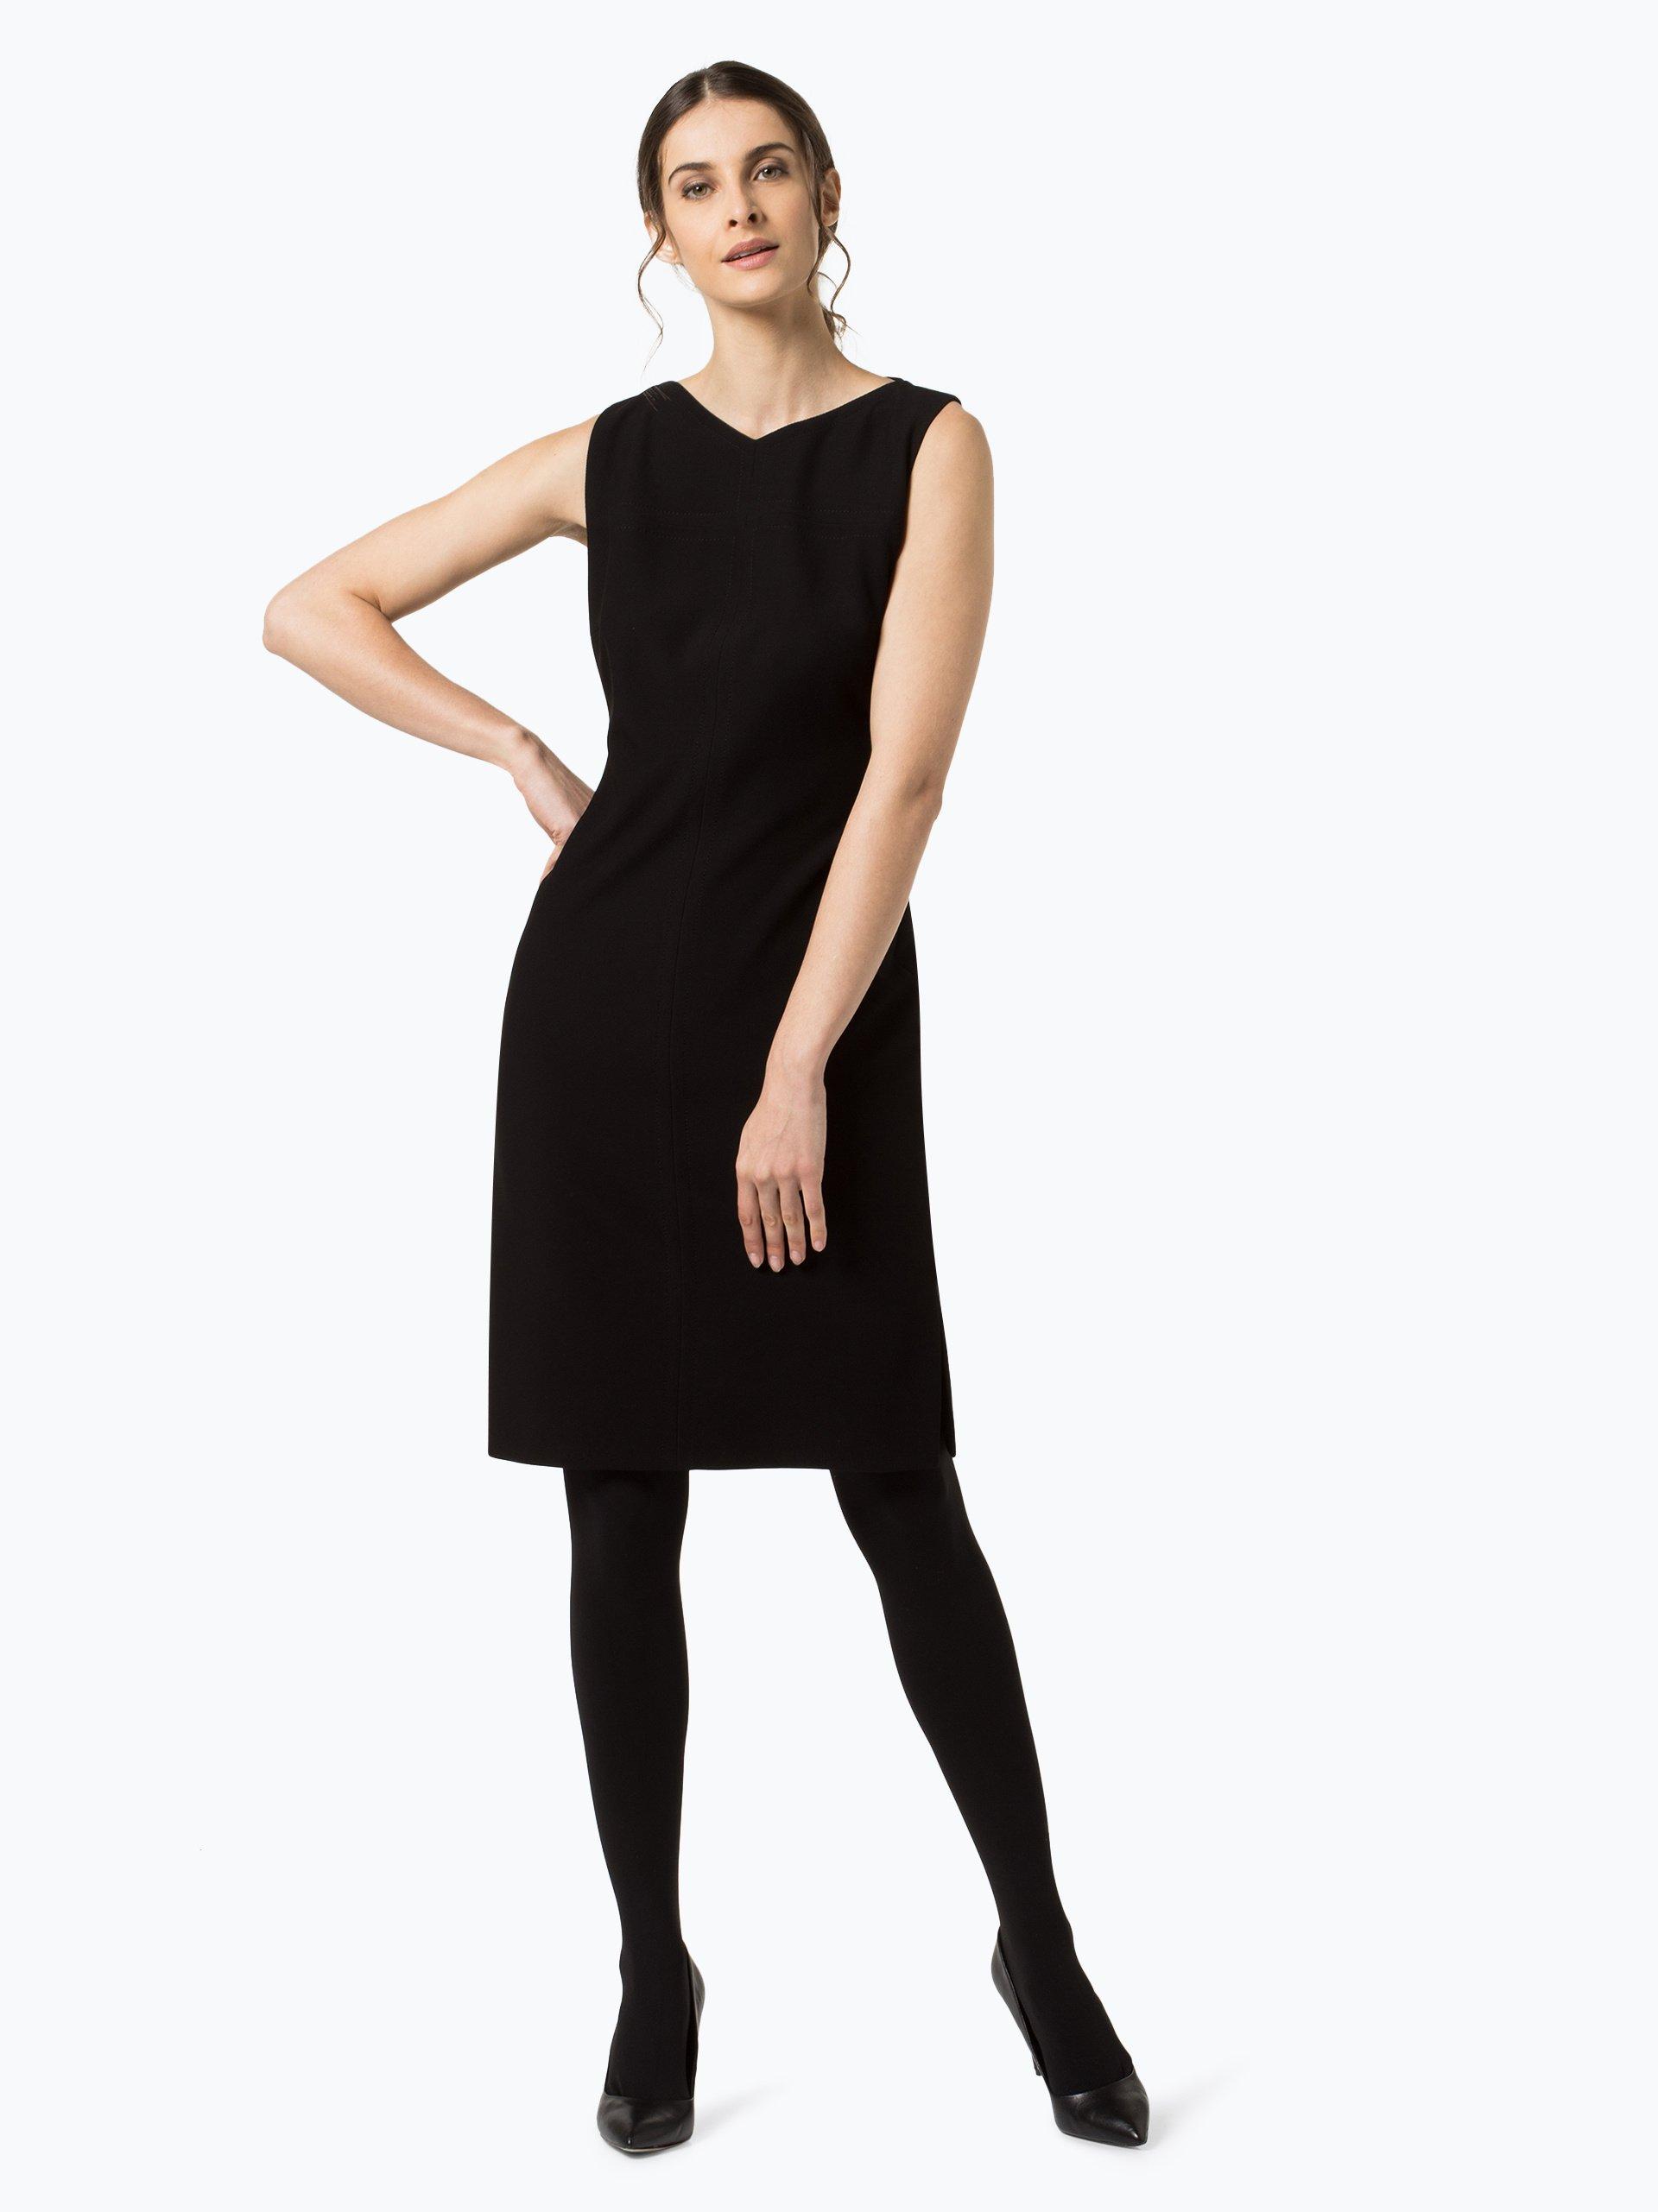 BOSS Damen Kleid - Dilamena